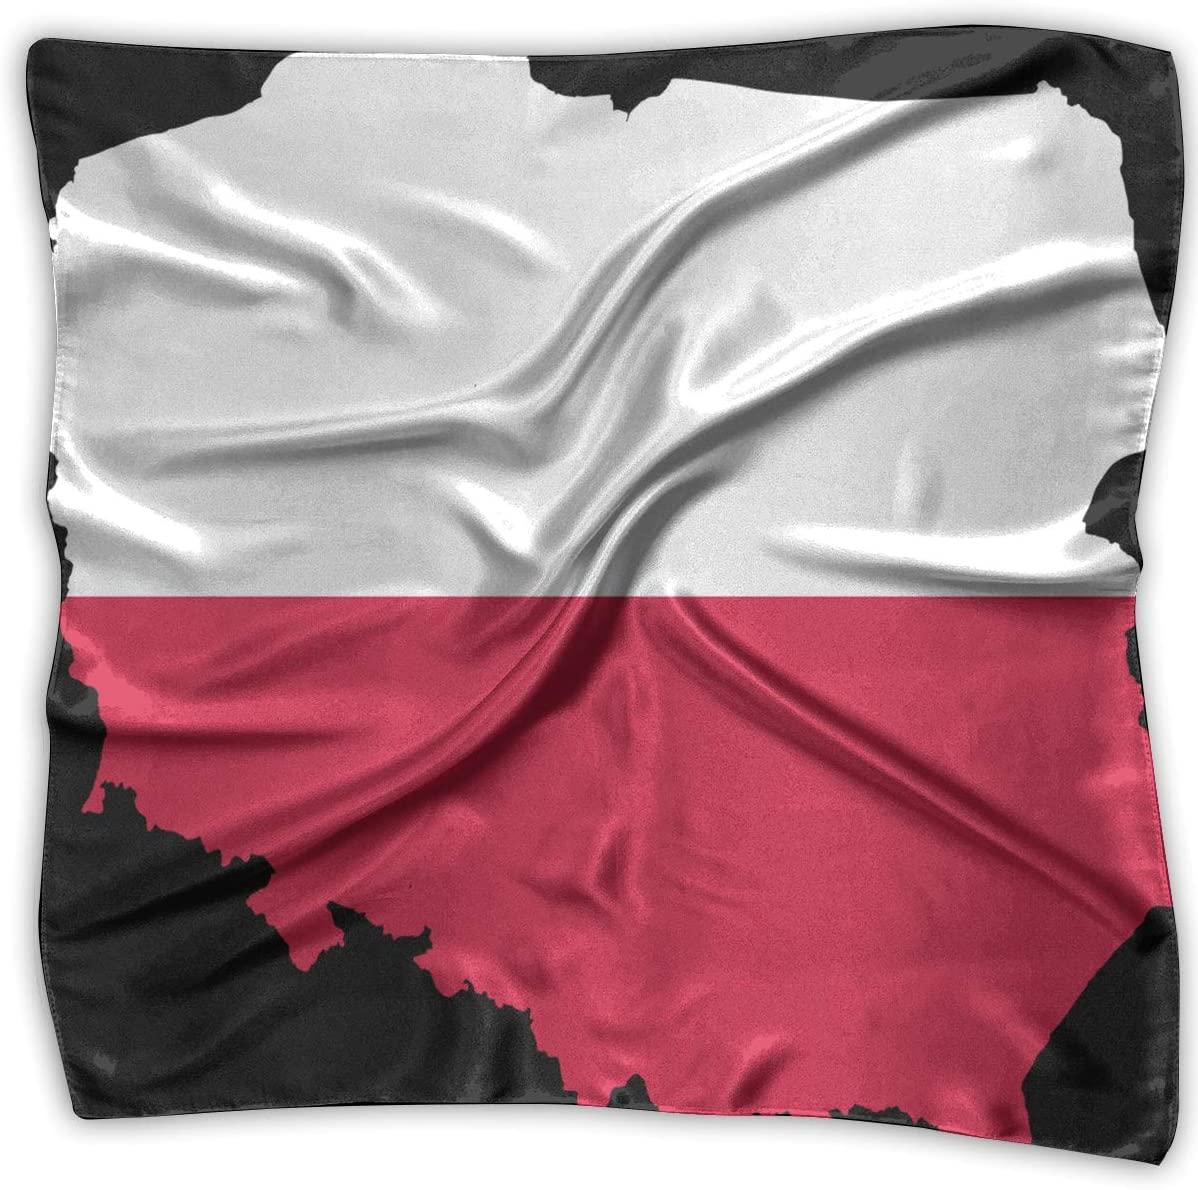 WFIRE 2018 Poland Flag and Map Square Handkerchiefs Scarf Shawl Bandanas Headscarf Neckerchief Tie Hair Scarf